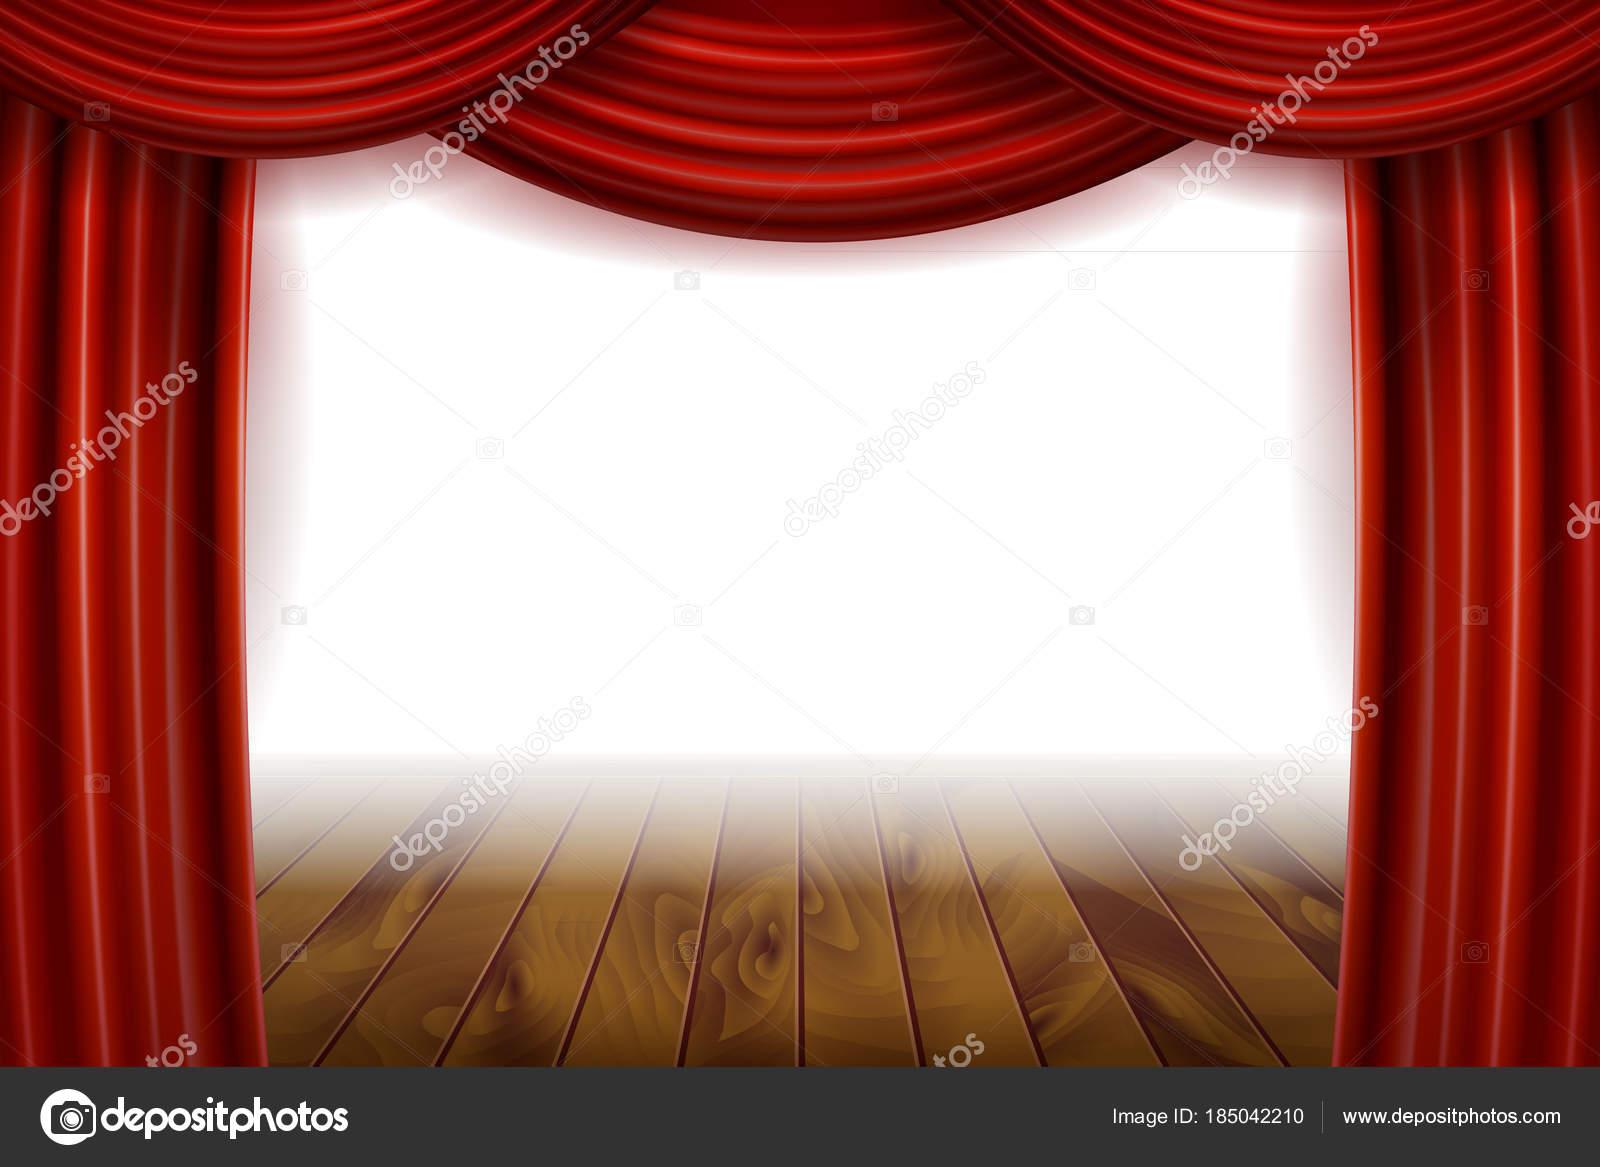 red vector zigzag illustration depositphotos stock velvet curtain edita curtains white flat and black floor